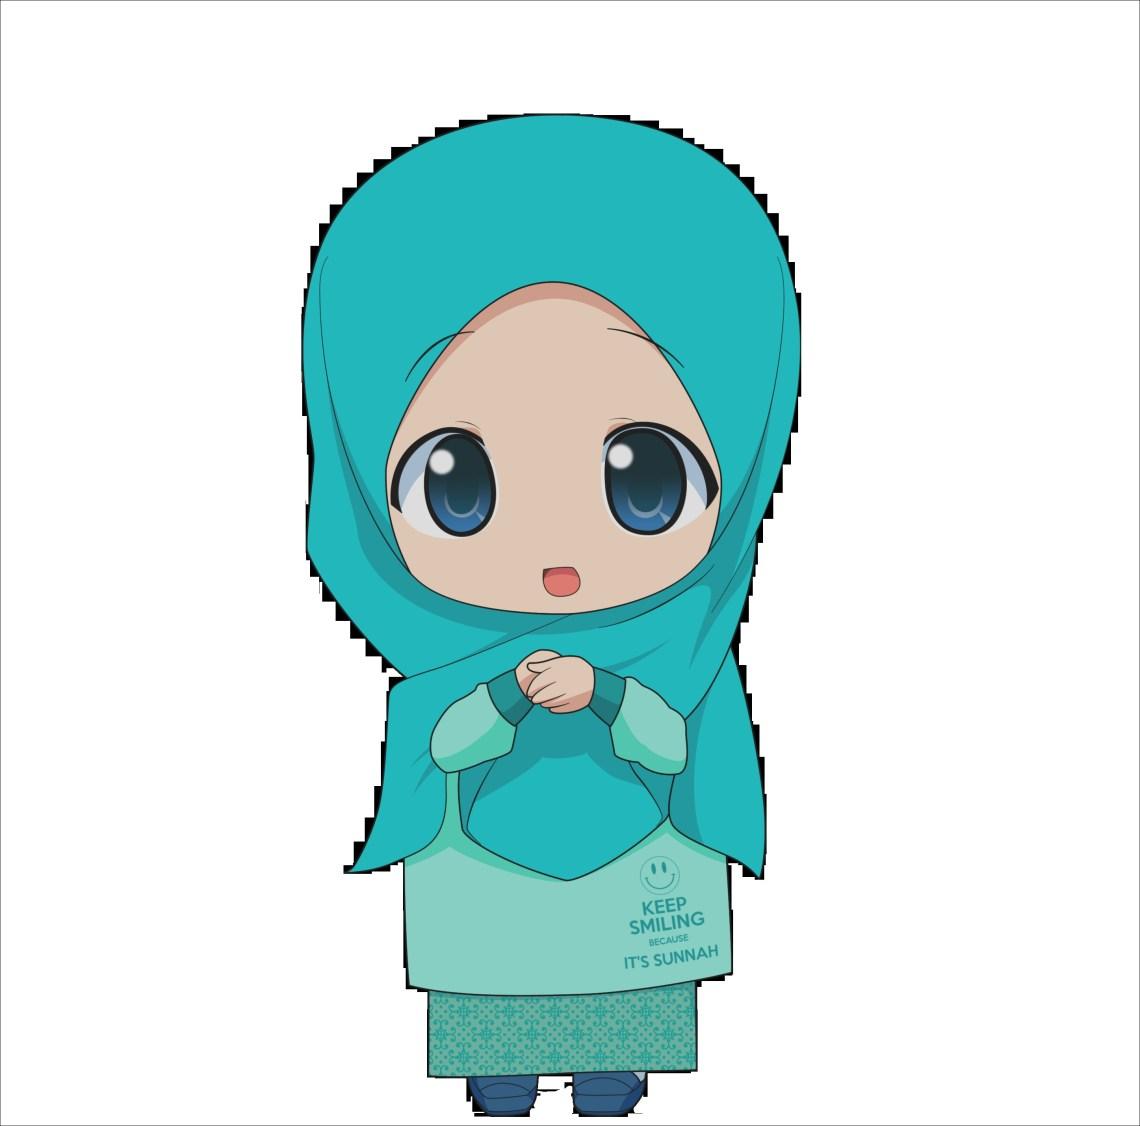 21 Gambar Kartun Muslimah Lucu Unik Imut & Terbaru